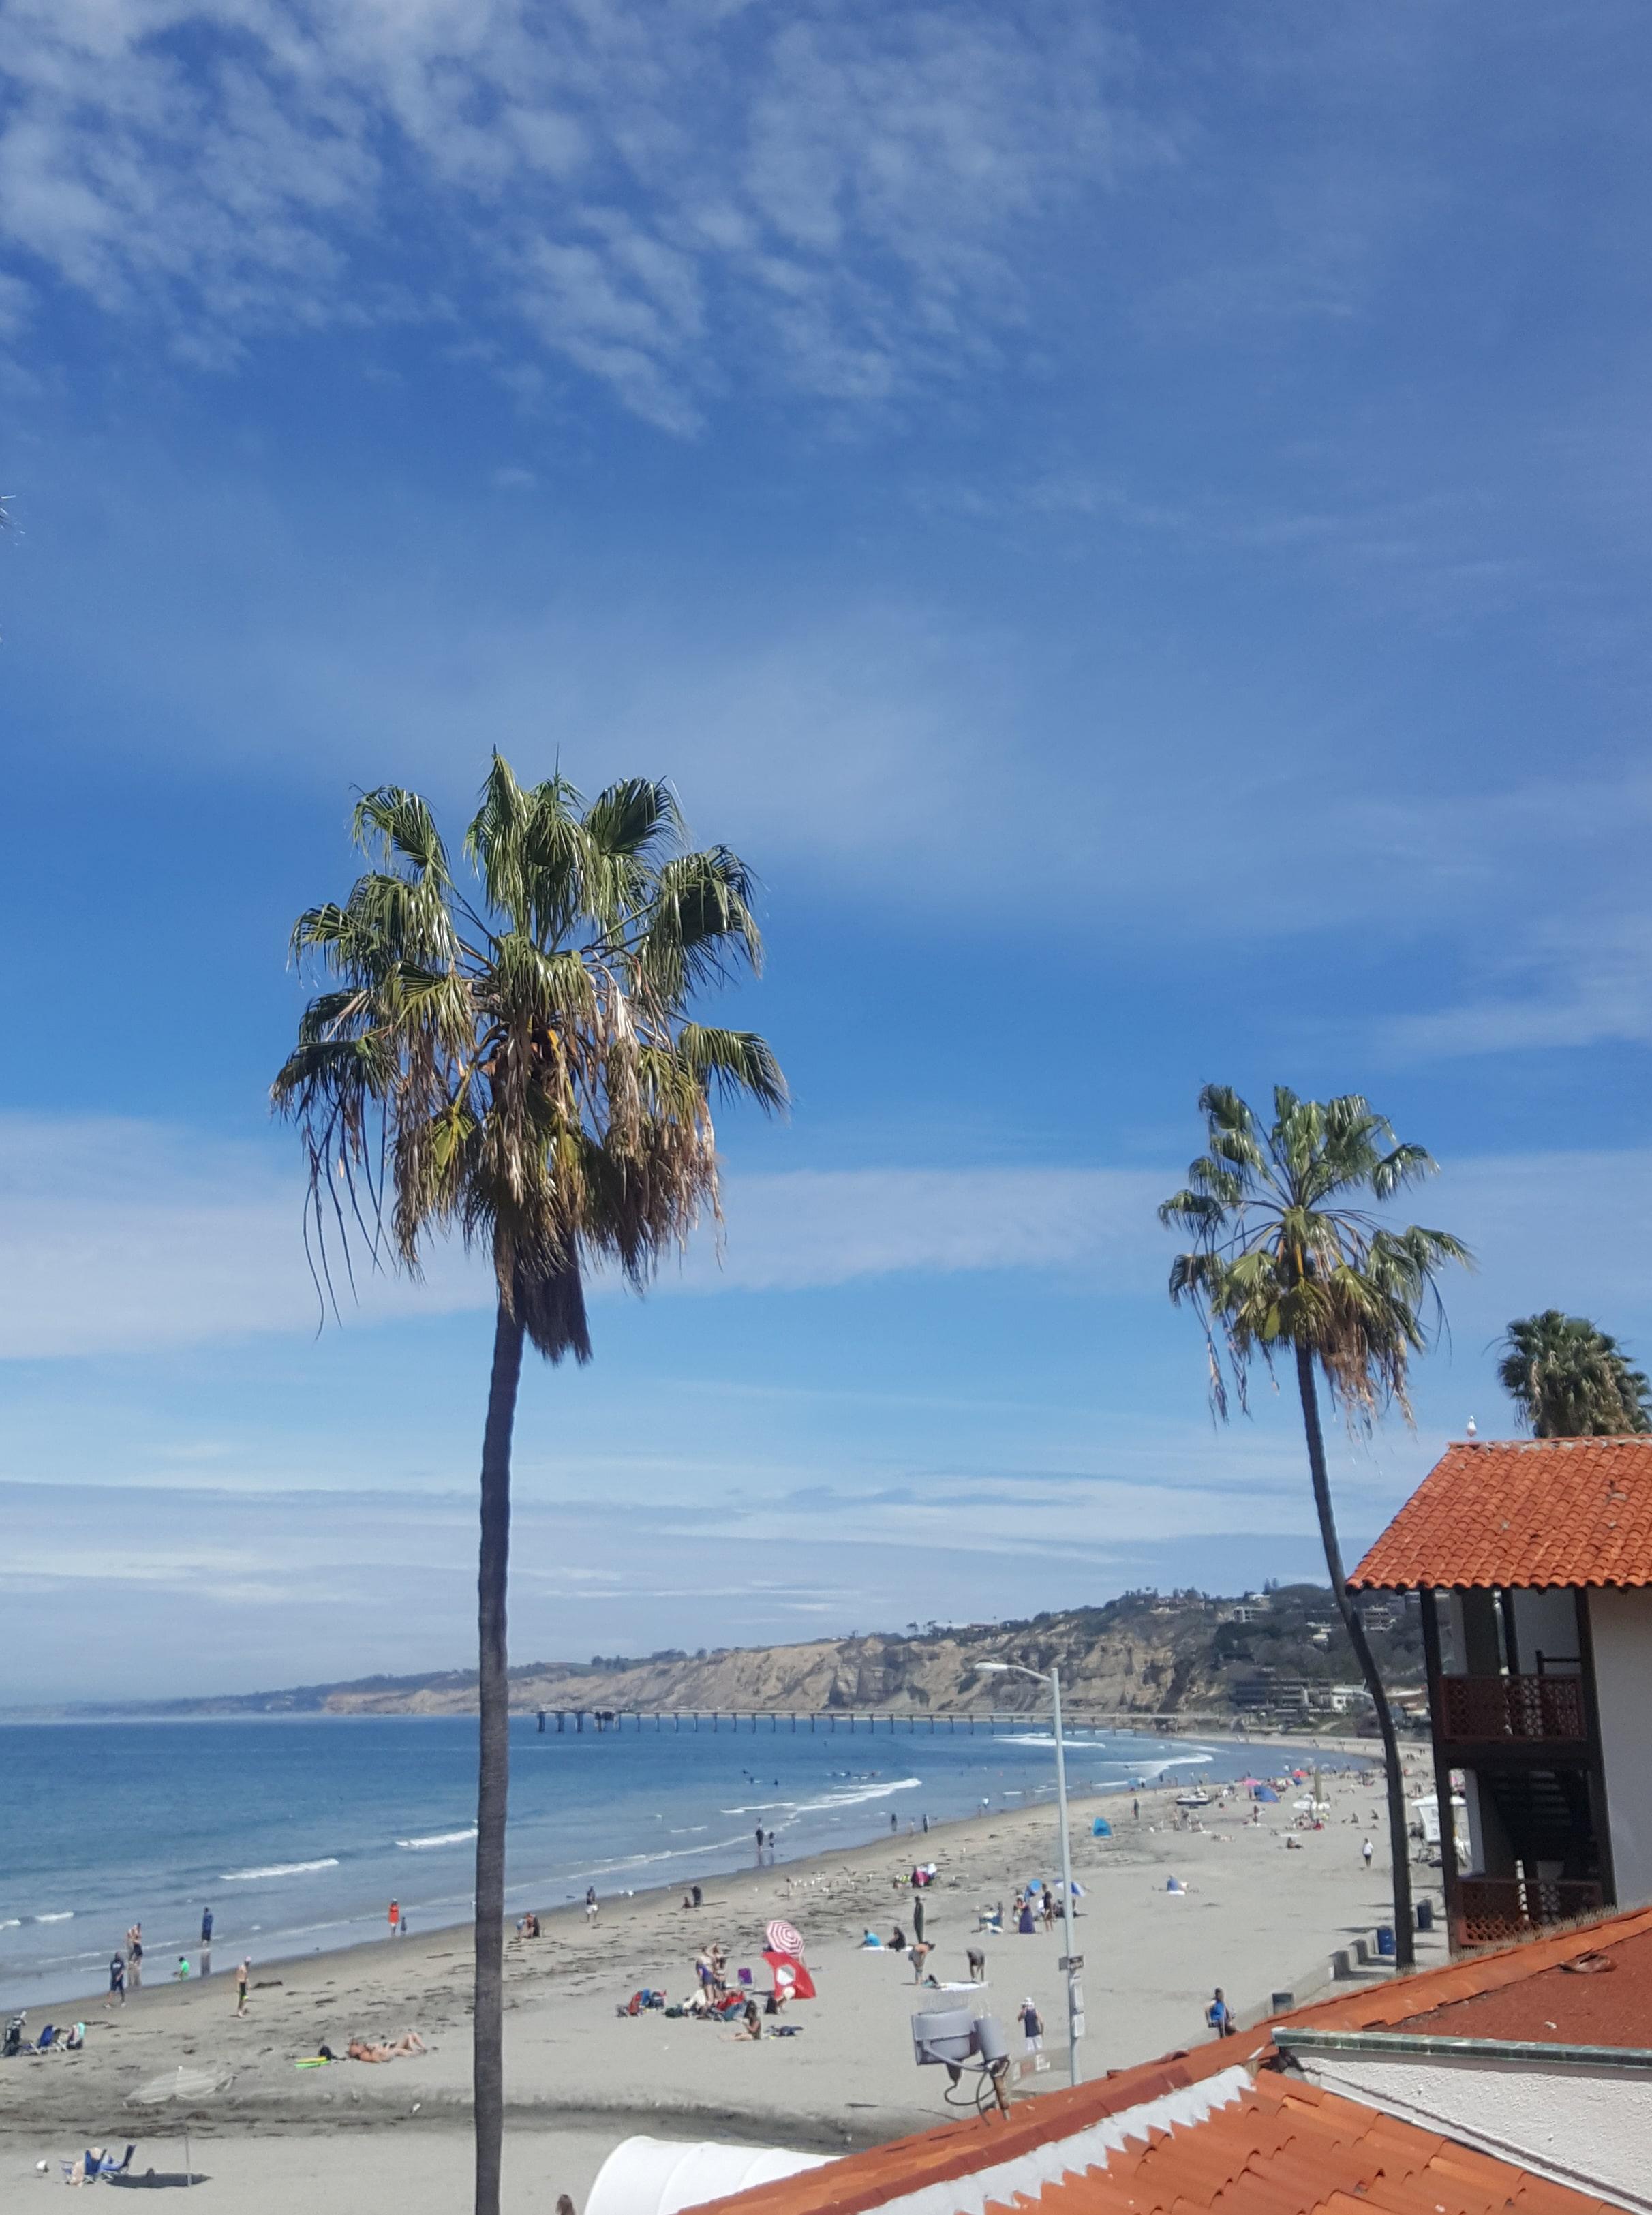 La Jolla Shores Hotel: A beachfront San Diego hotel